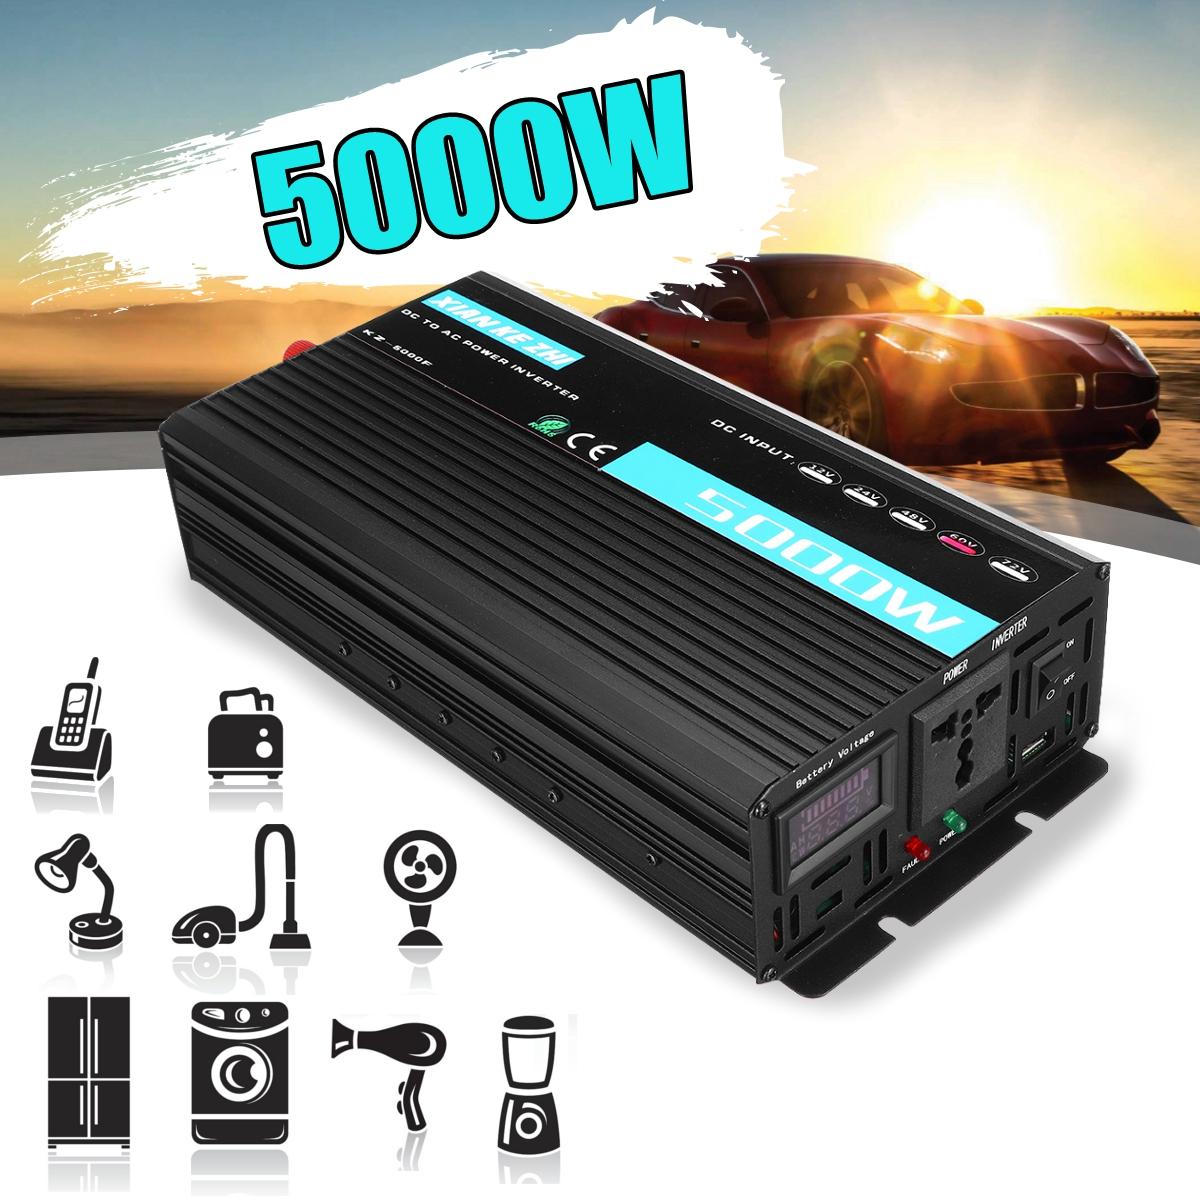 2200W Display Home Use Inverter DC 12/24/48/60/70V to AC 220V Intelligent Multiple Protection Power Converter